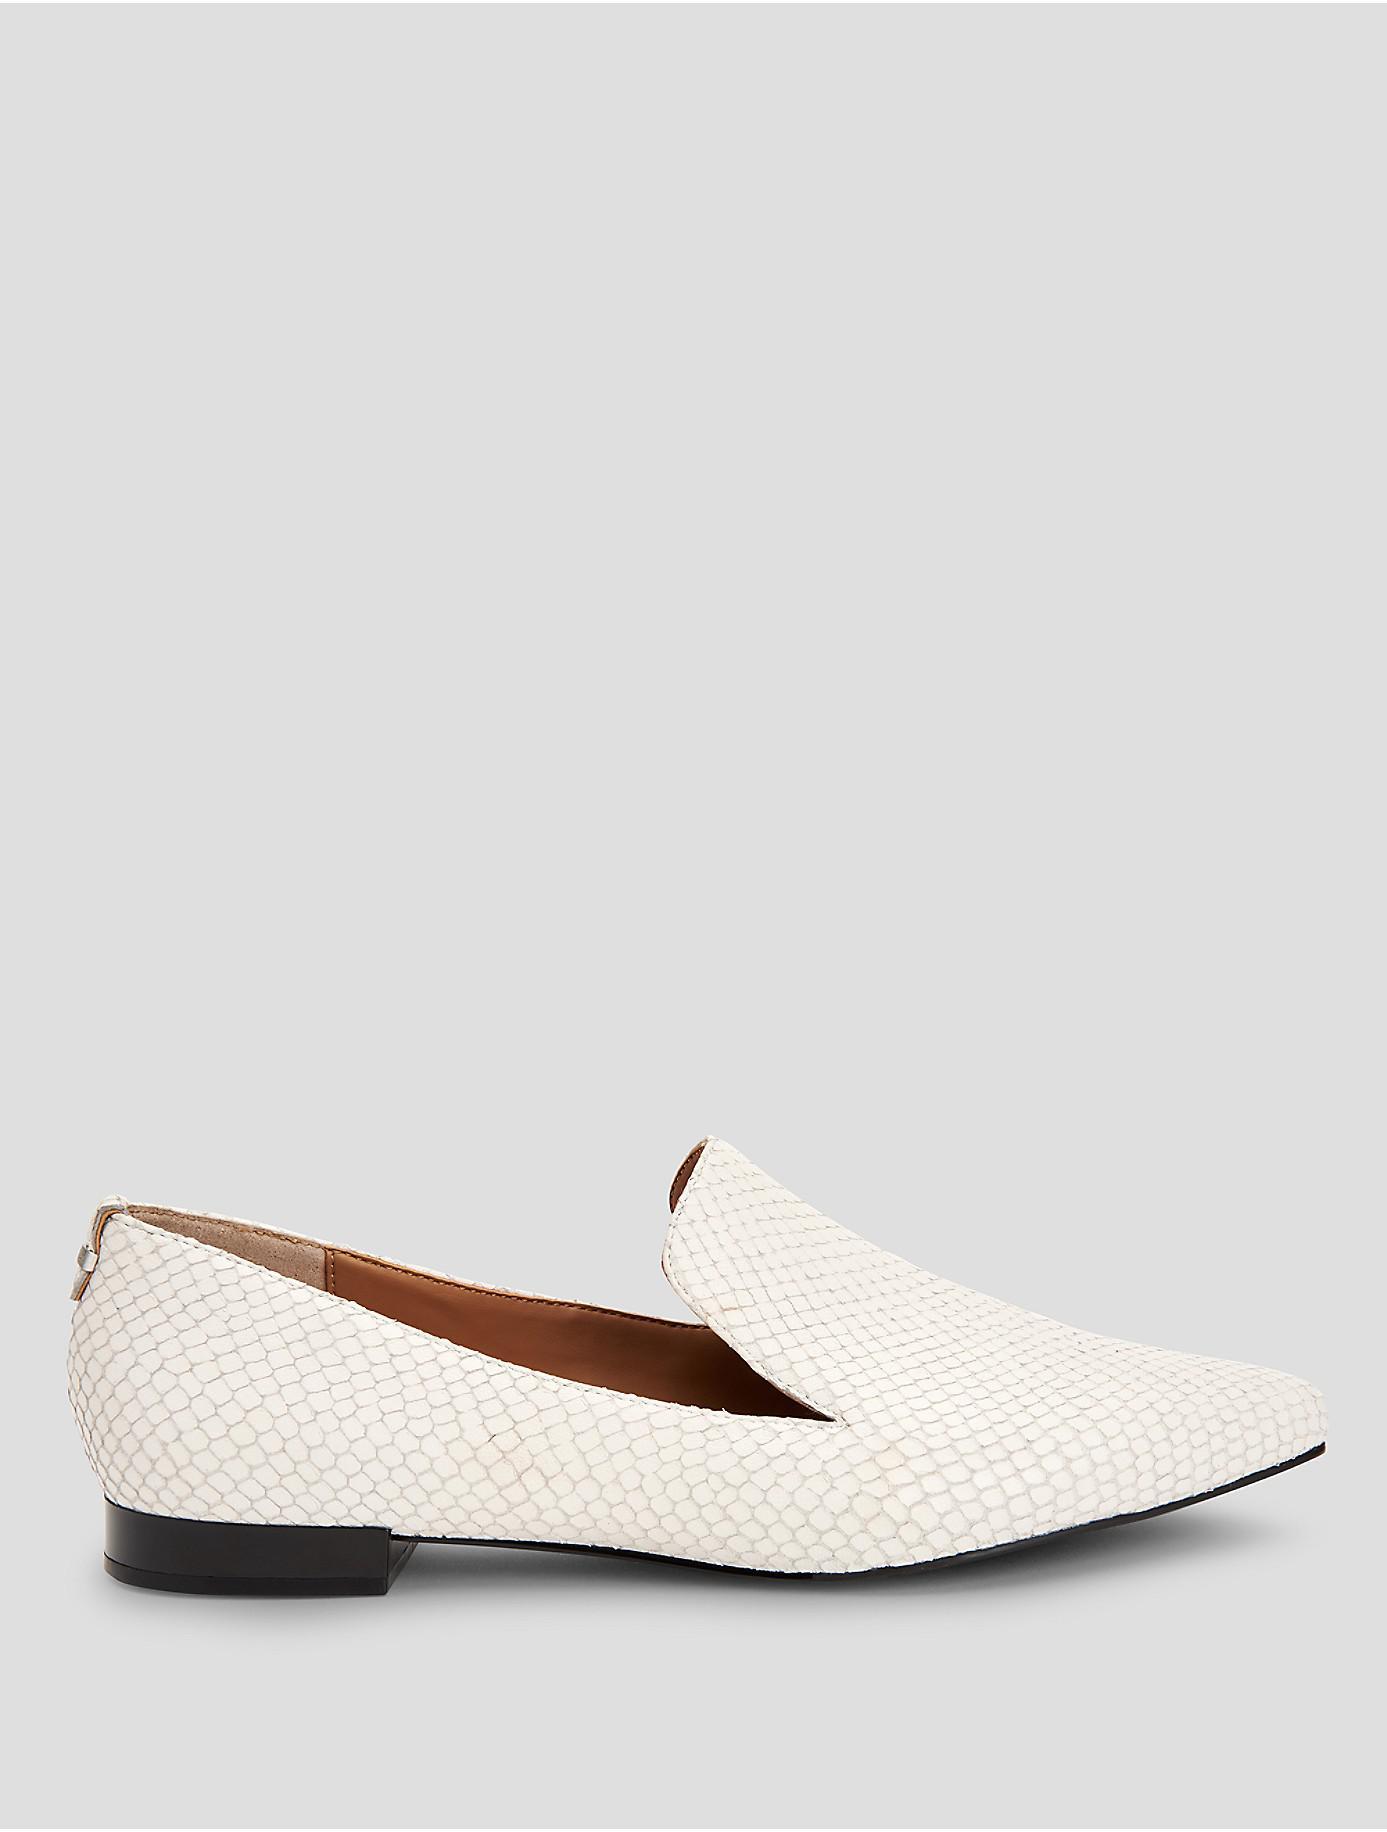 52c681b79a3 Lyst - CALVIN KLEIN 205W39NYC Elin Matte Snake Loafer in White